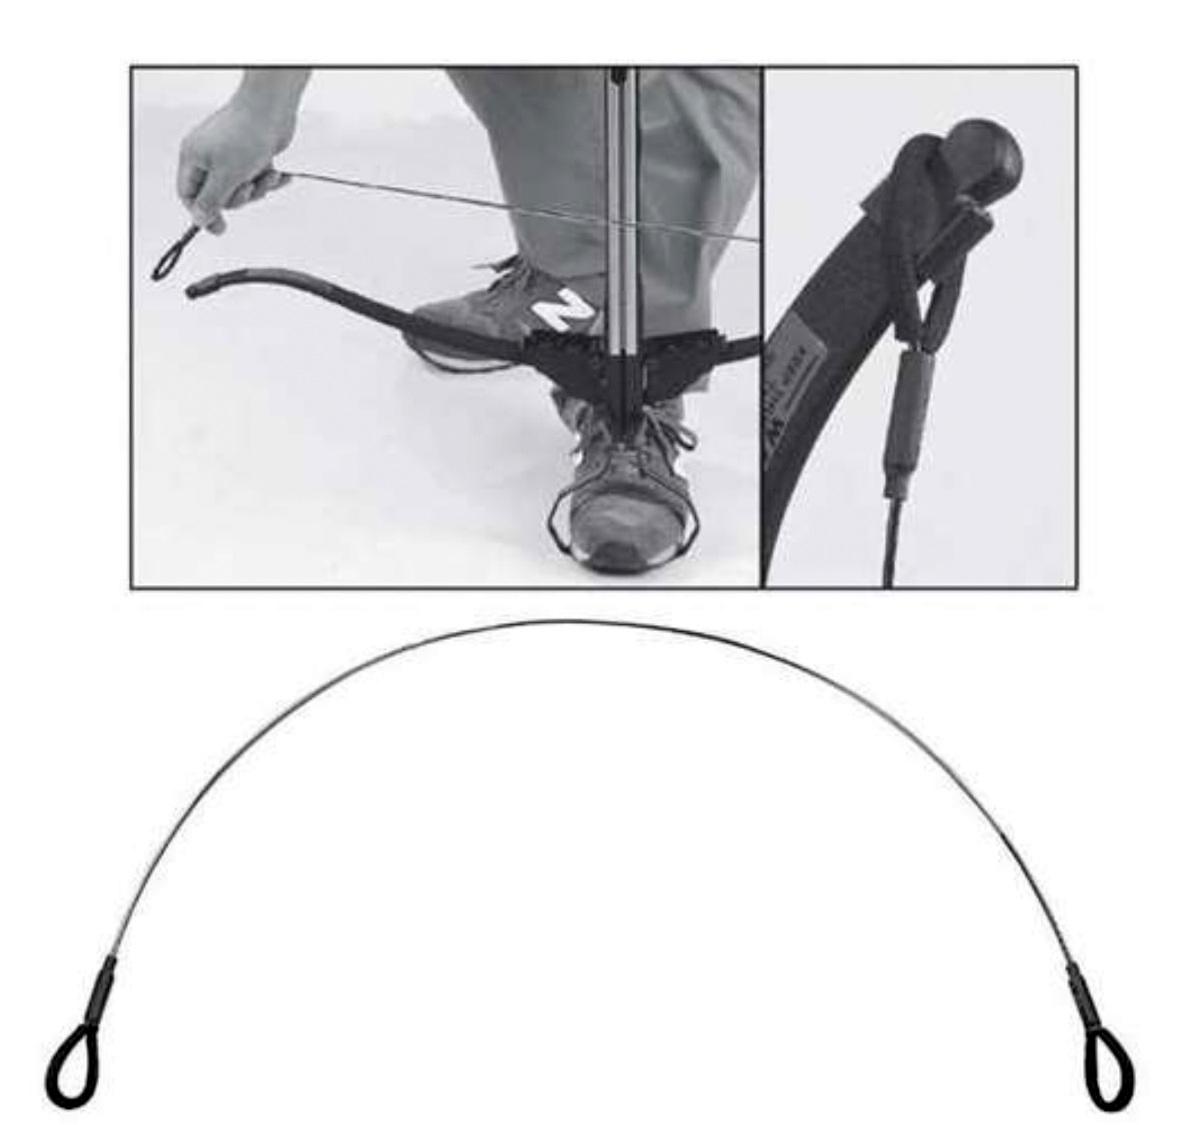 Fausse corde arbalète bandoir aide armement